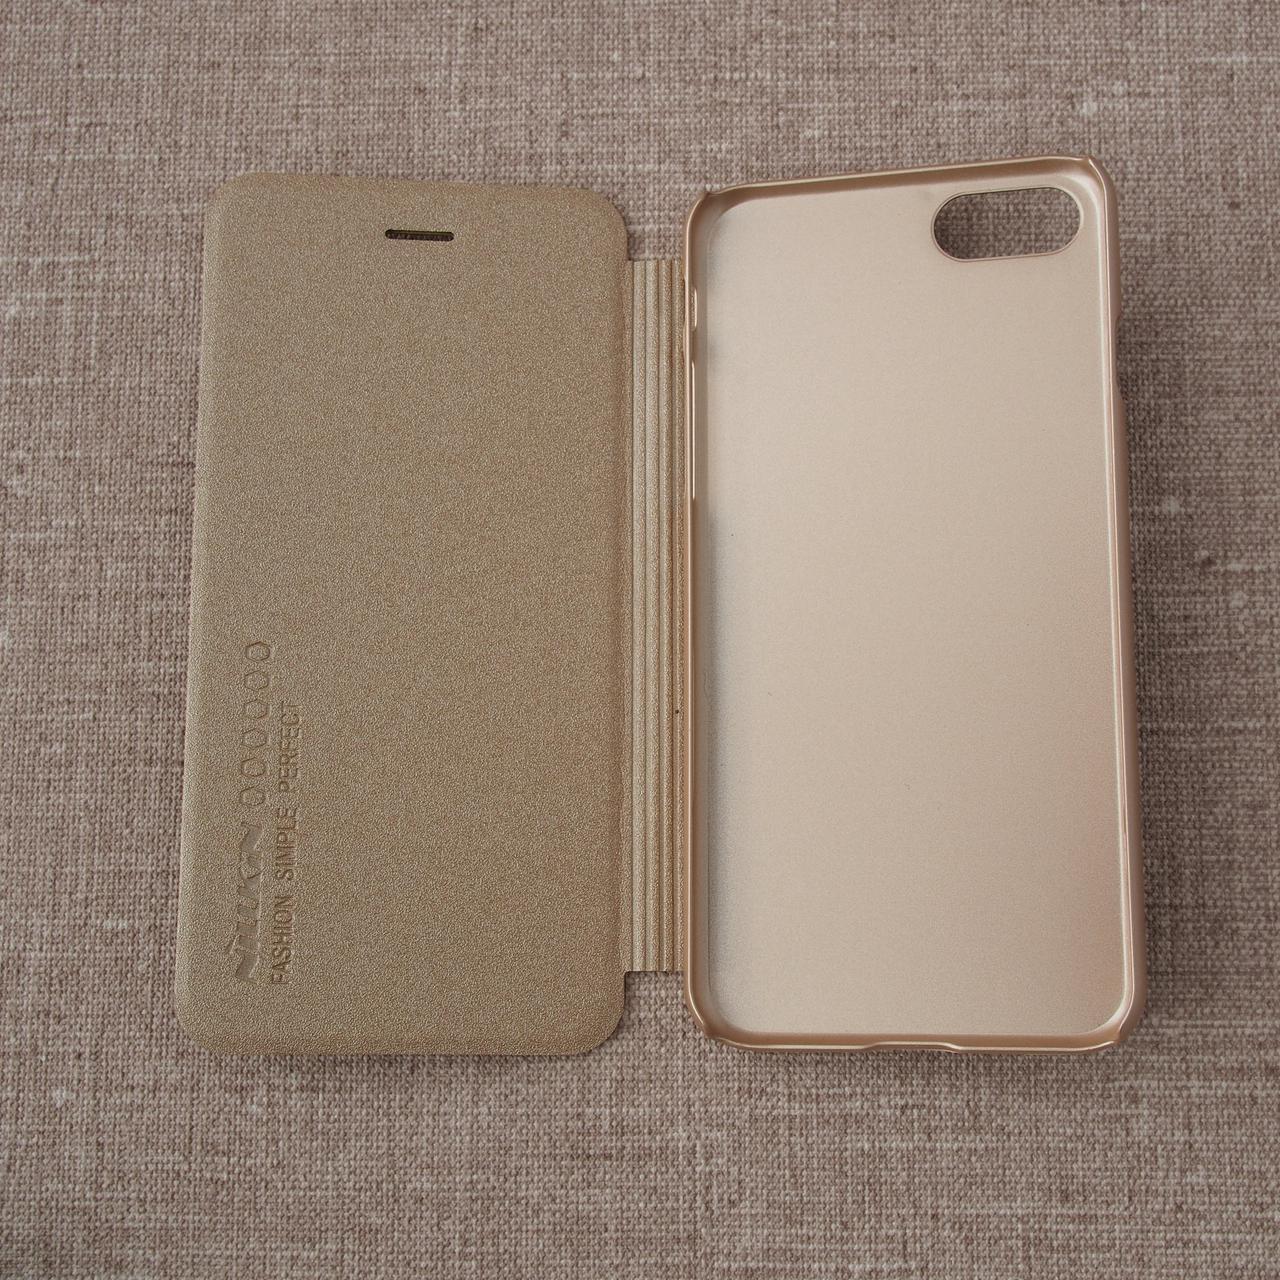 Nillkin Sparkle iPhone 7 gold